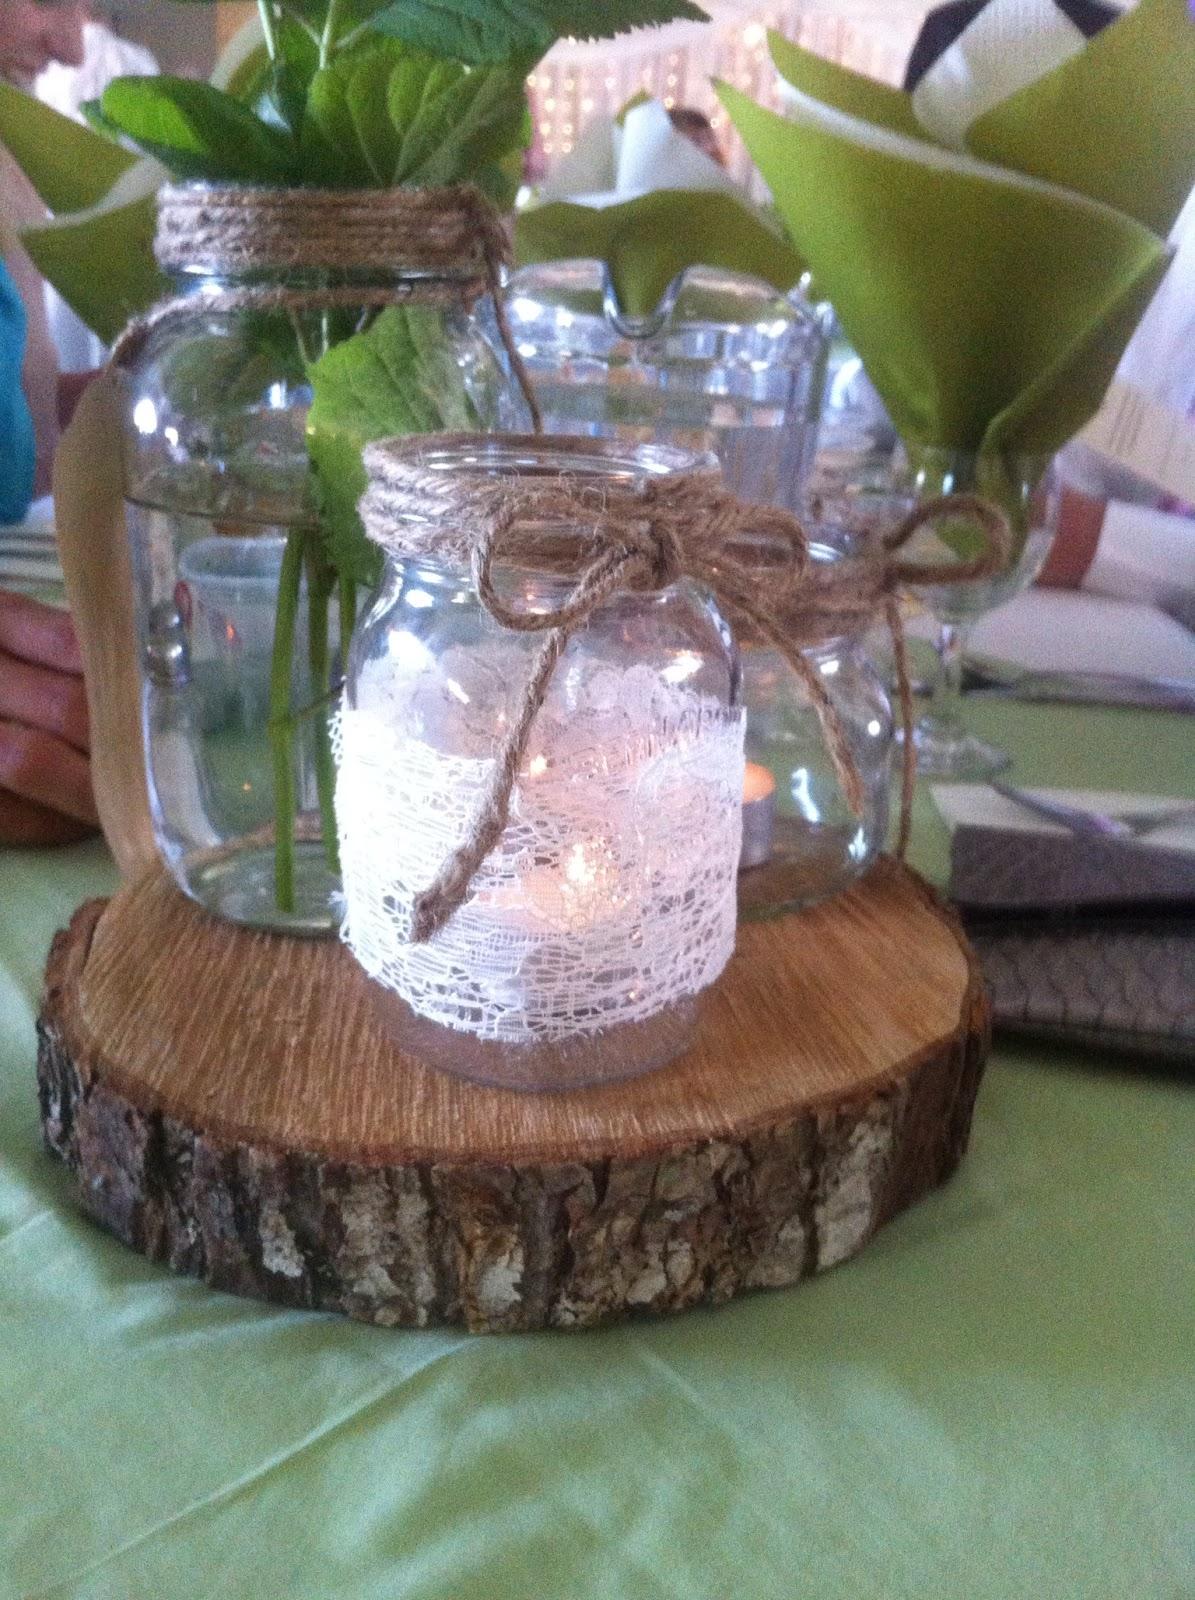 10 Marvelous DIY Rustic & Cheap Wedding Centerpieces Ideas ...  |Diy Rustic Wedding Table Centerpieces